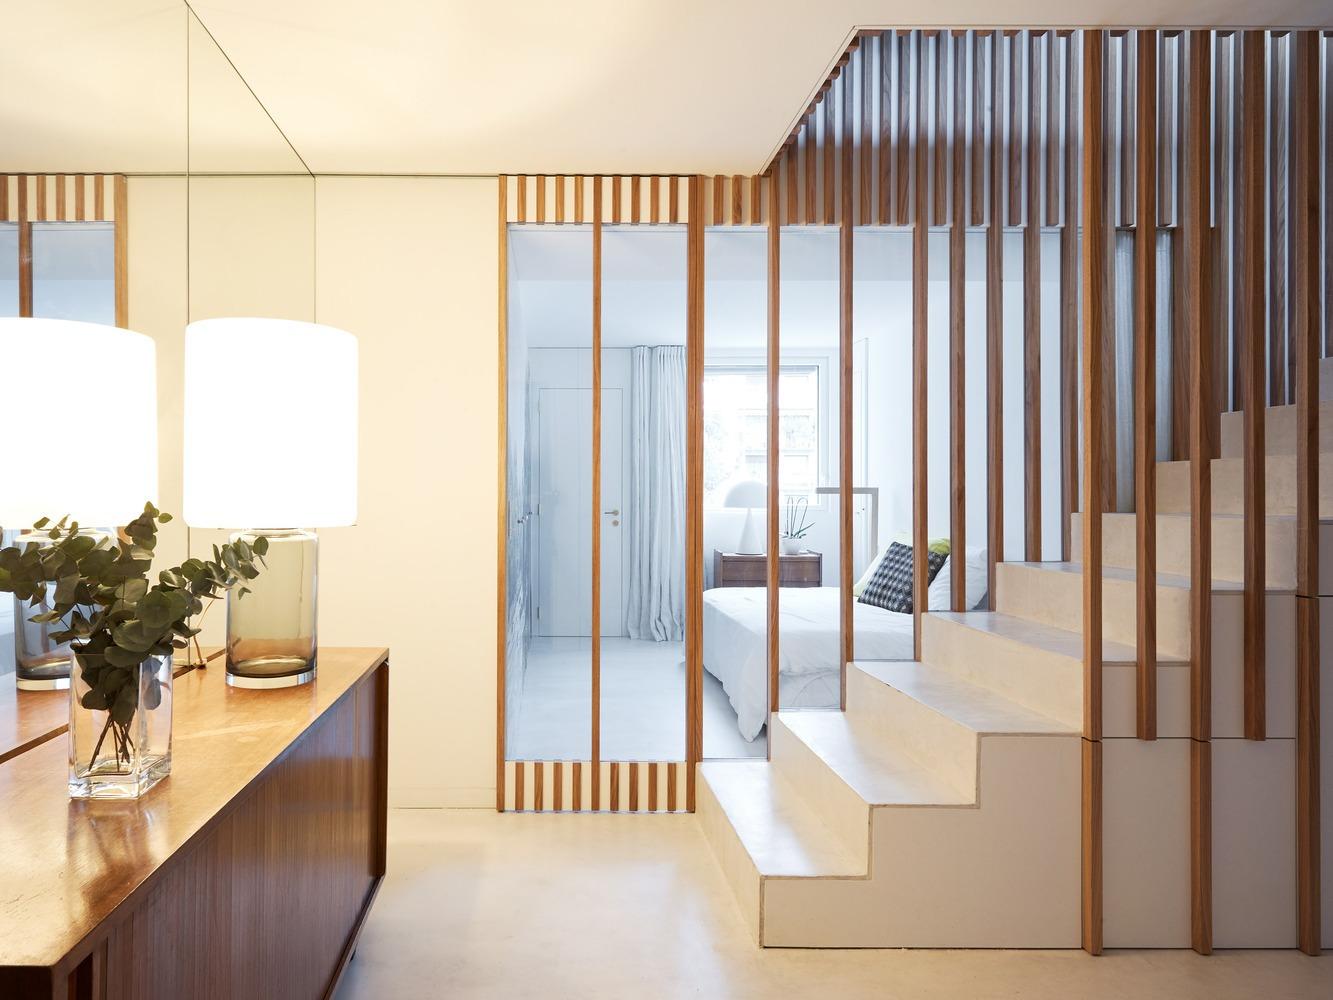 05 AM Arquitectura / David Foessel